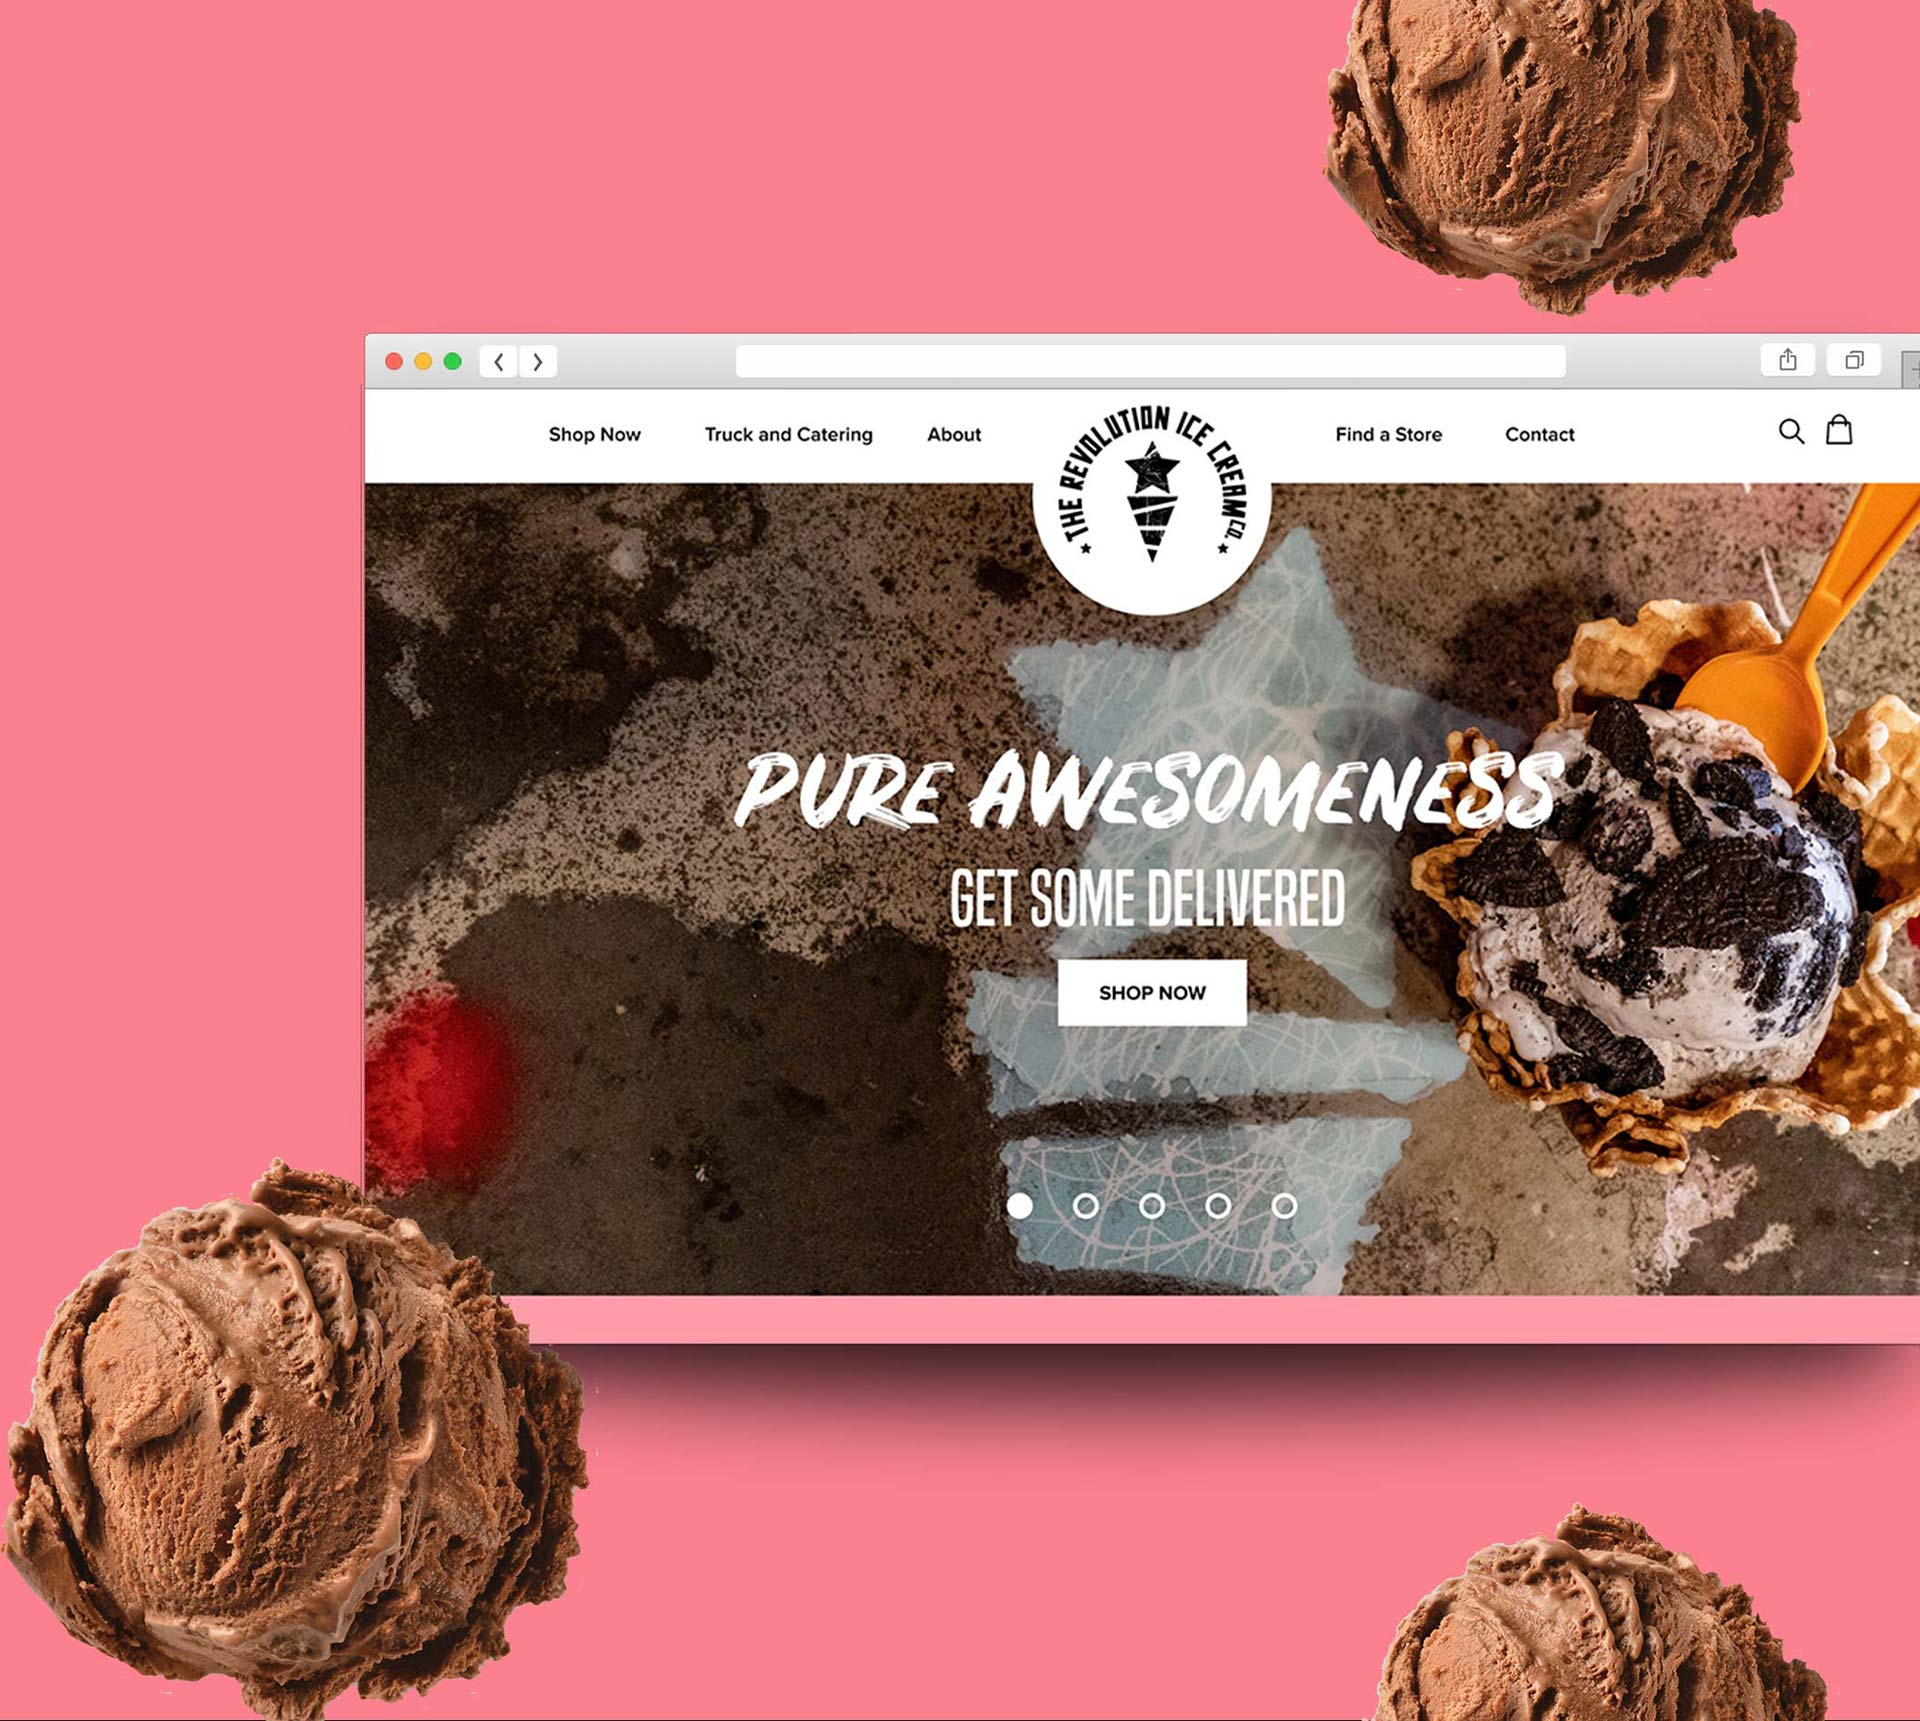 Icecream Shopify Website Design